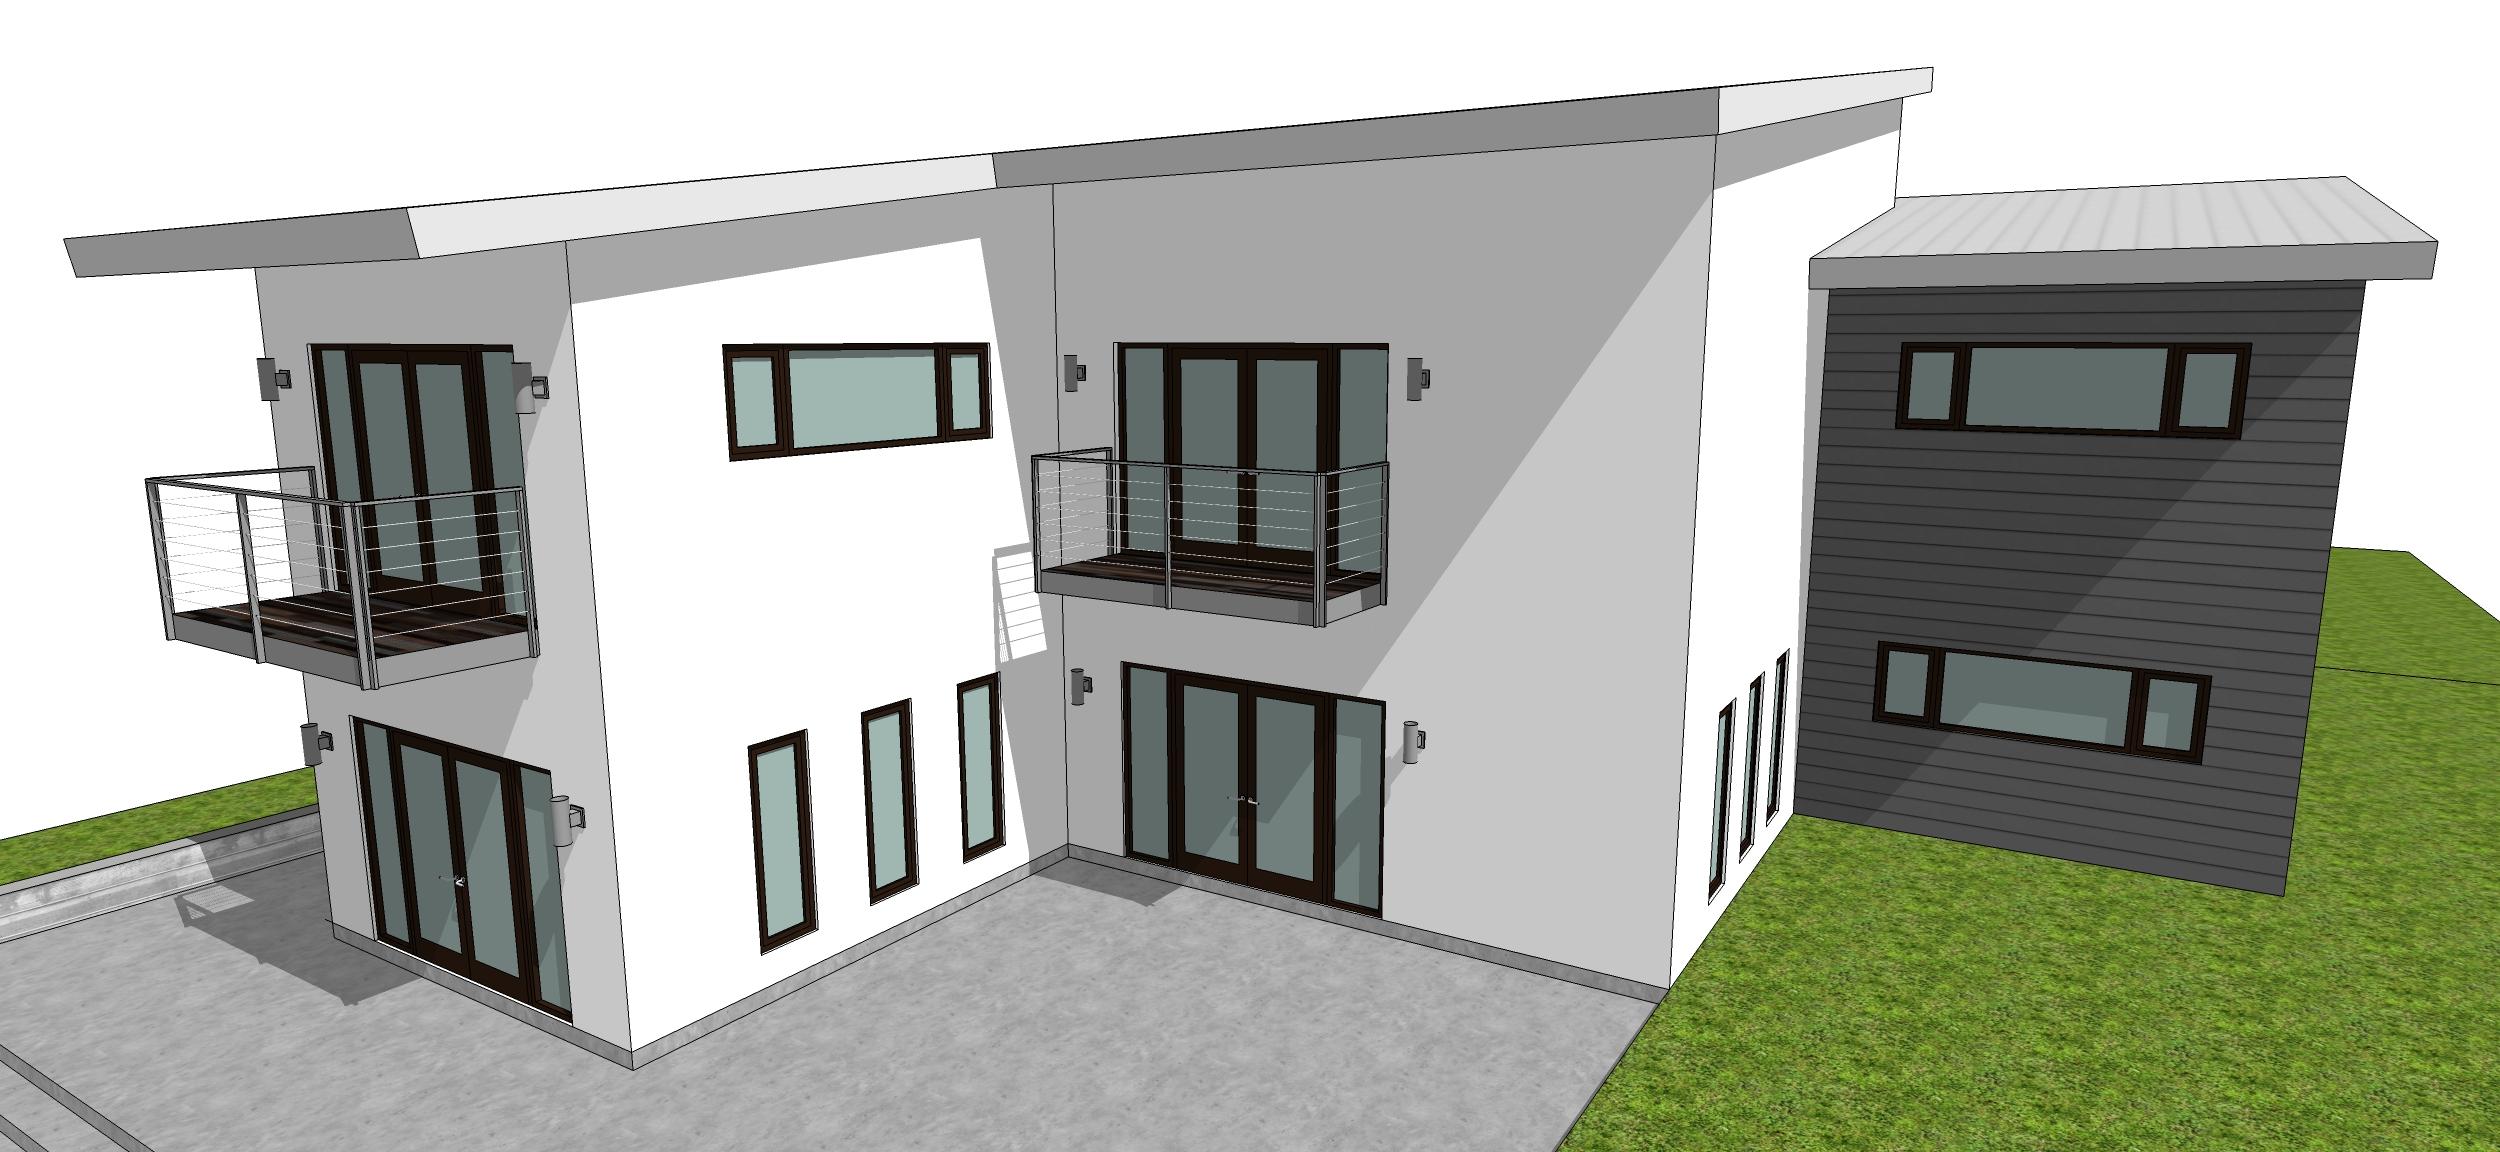 House 2 - Southeast View.jpg